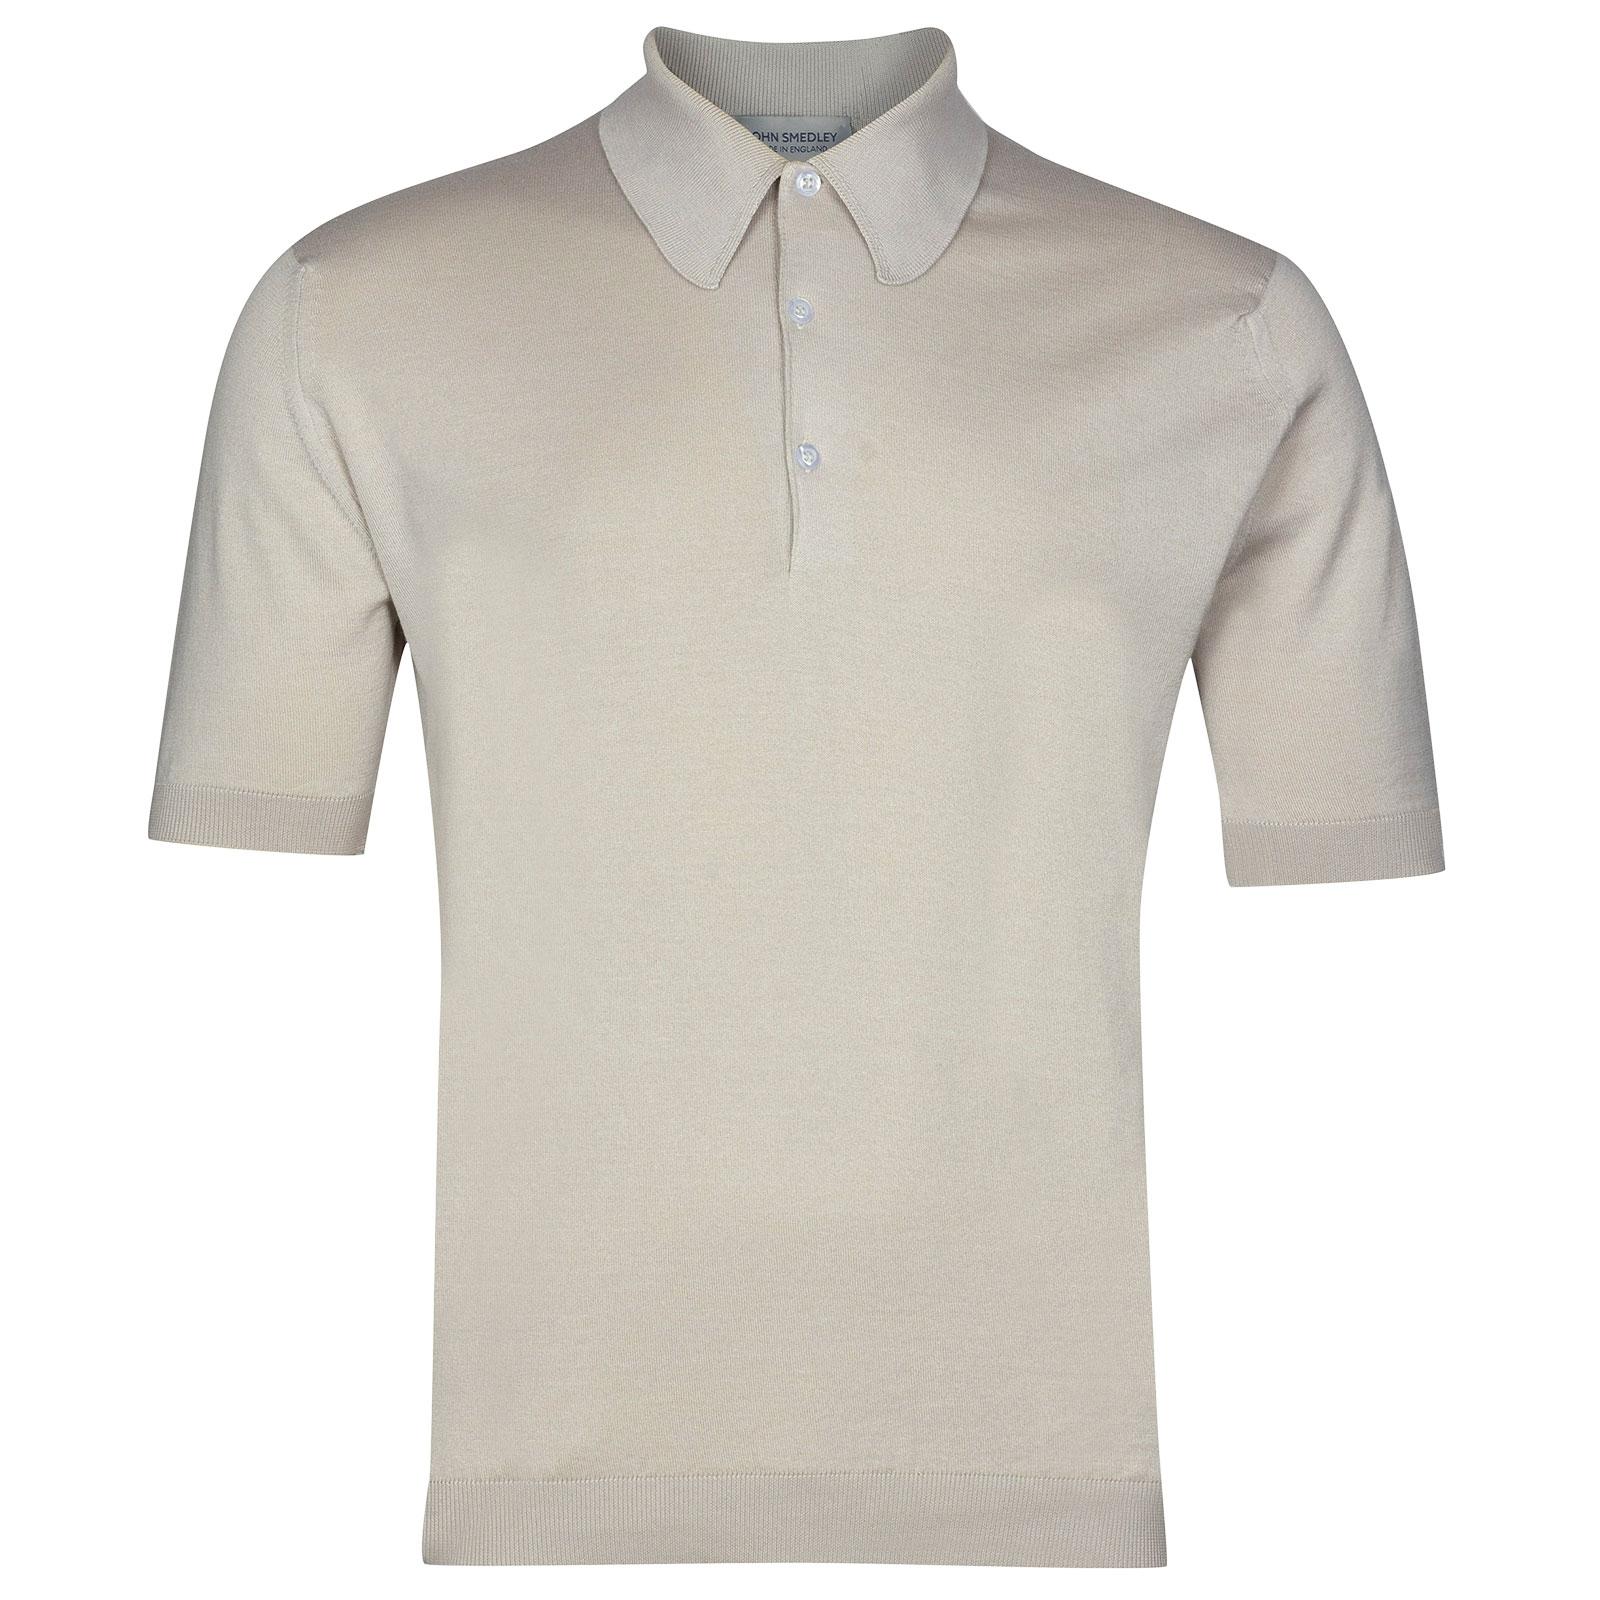 John Smedley Isis in Brunel Beige Shirt-XSM